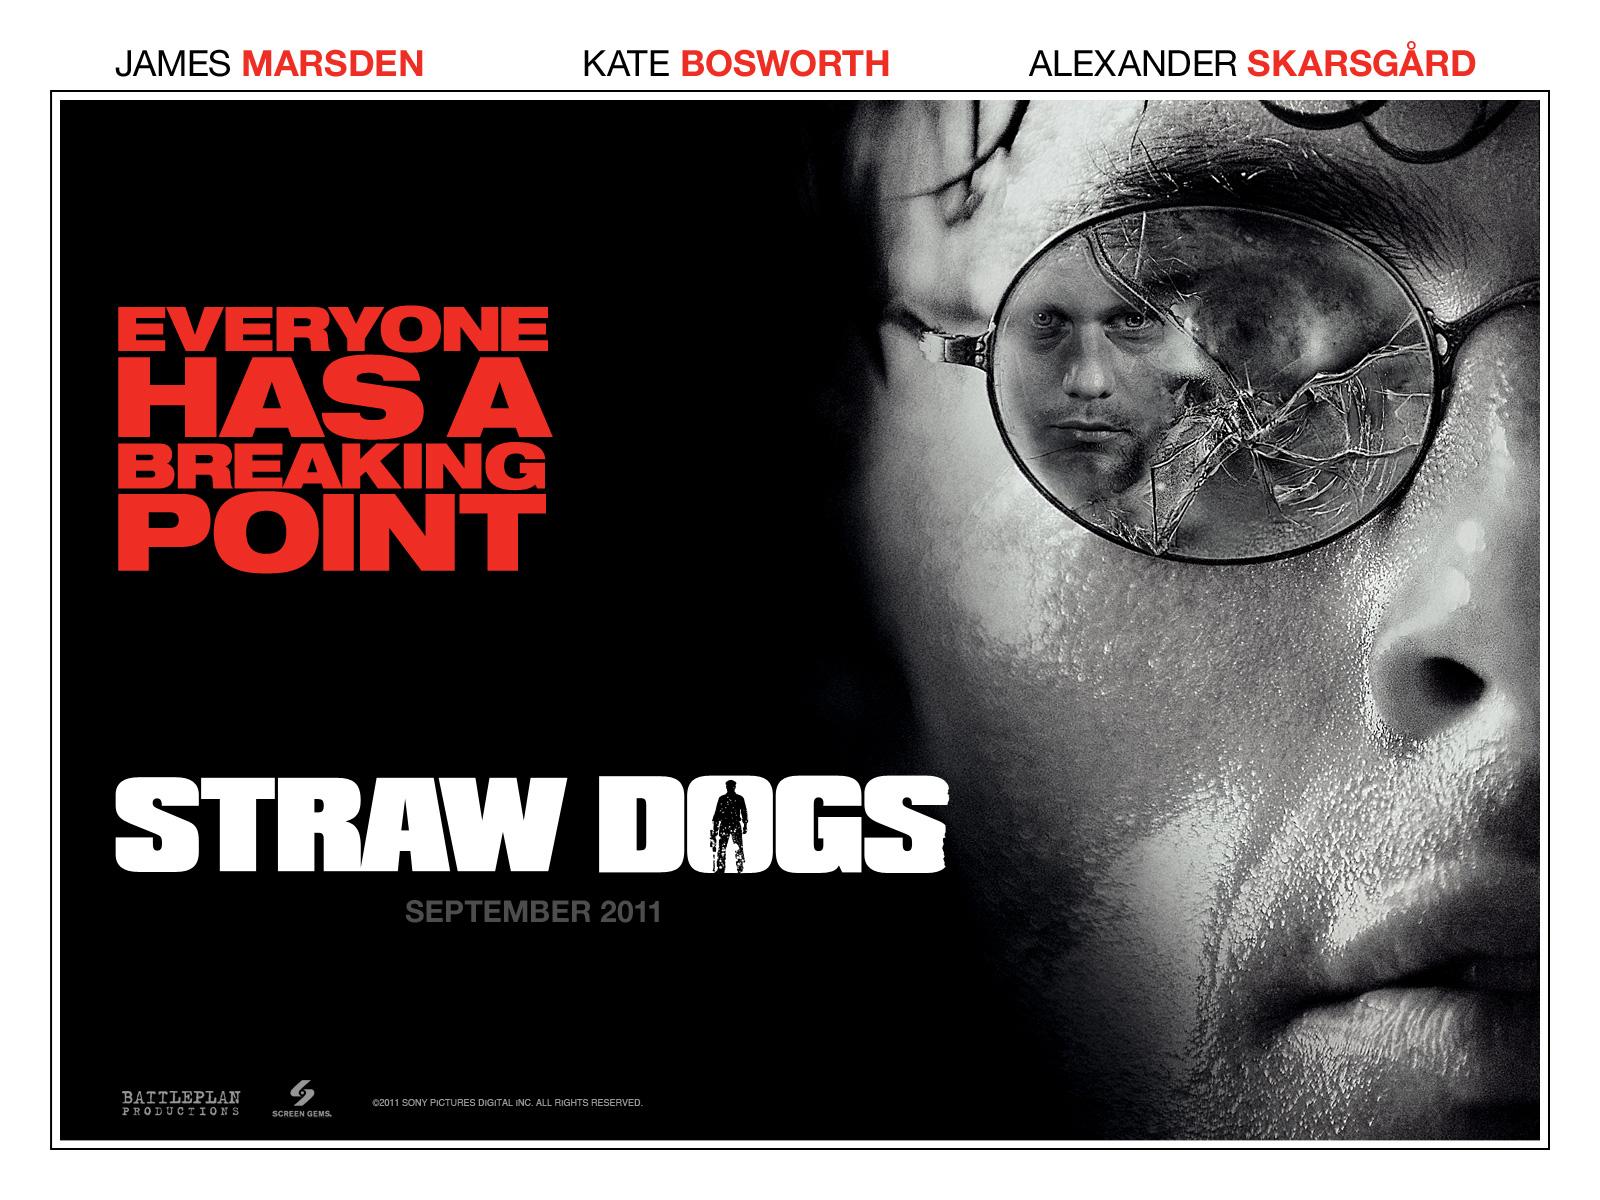 http://1.bp.blogspot.com/-1cwQ06tOoBE/TpOgLCRRokI/AAAAAAAAAuA/WDXDp8K4gAg/s1600/Straw+Dogs.jpg